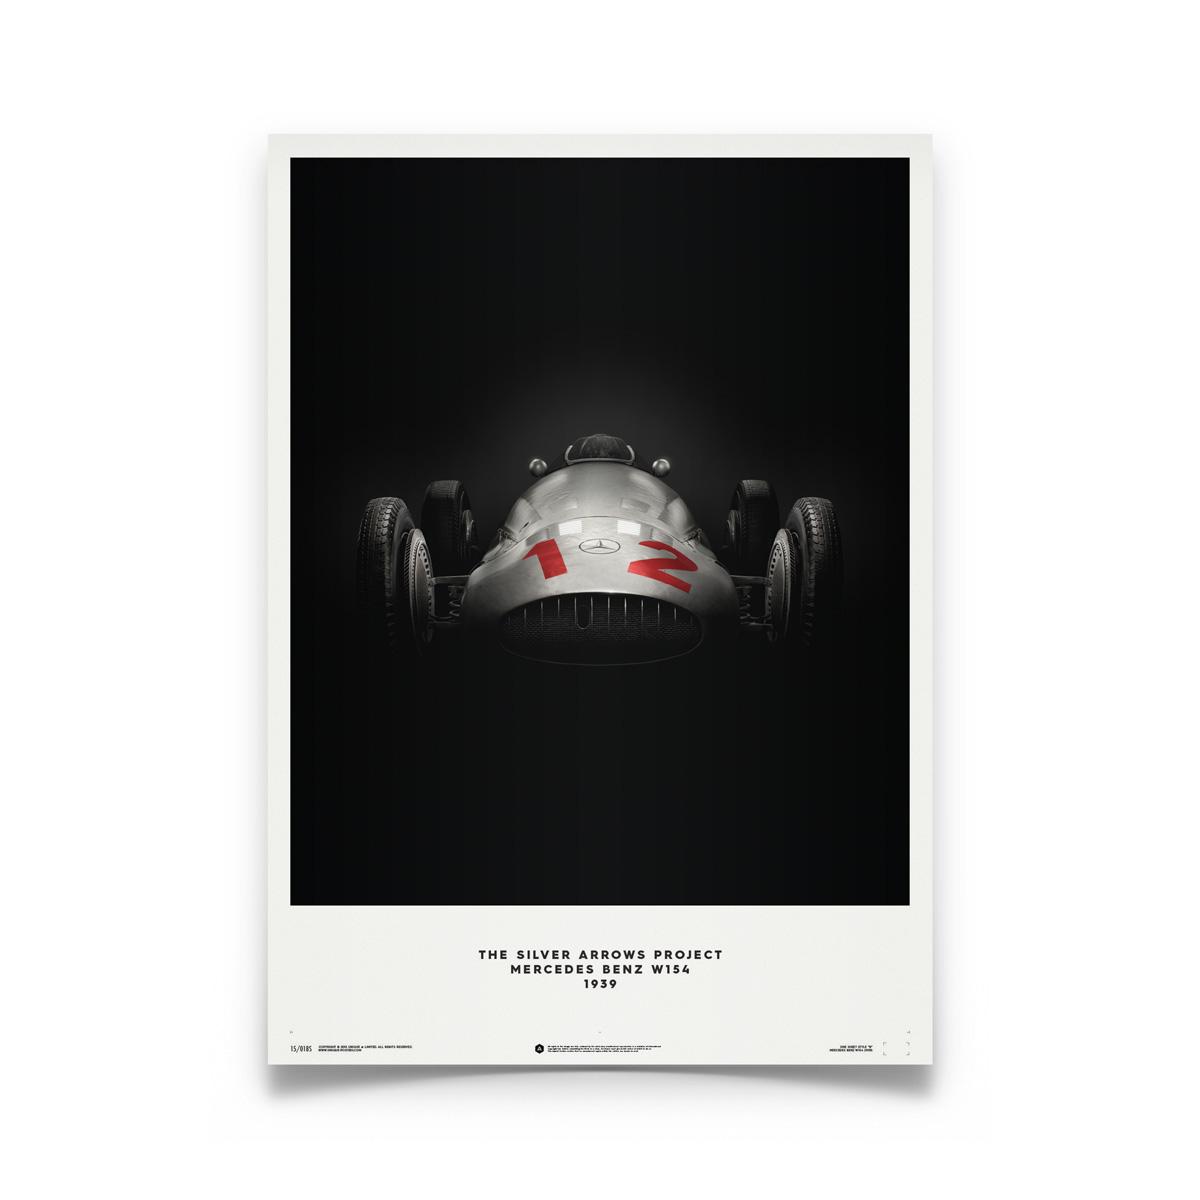 Product image for Rudolf Caracciola – Mercedes Benz W154 – Le Mans 1938 | Automobilist | Limited Edition poster